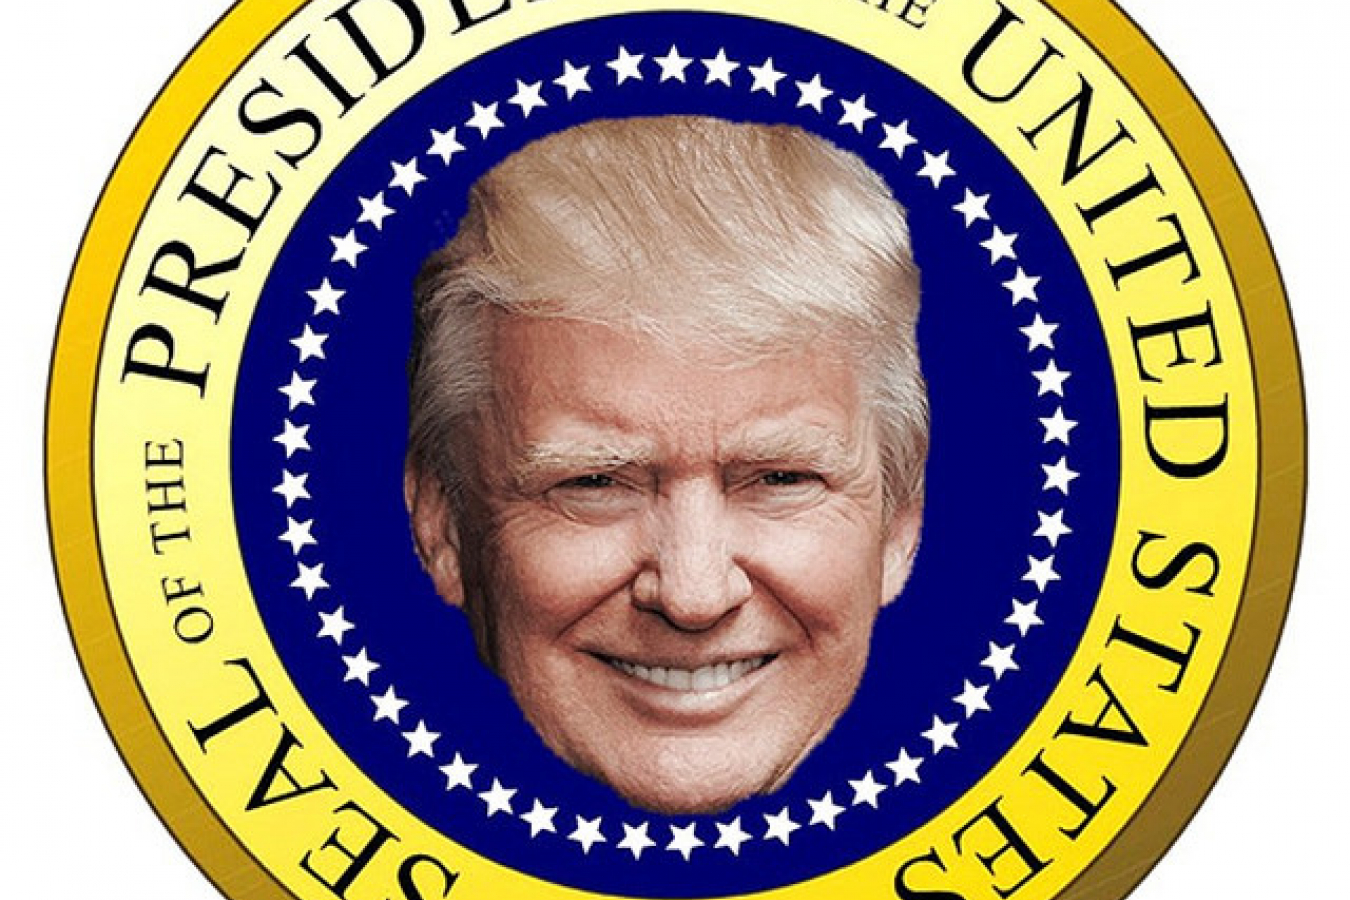 Donald Trump takes aim at US L1B visa extensions making them